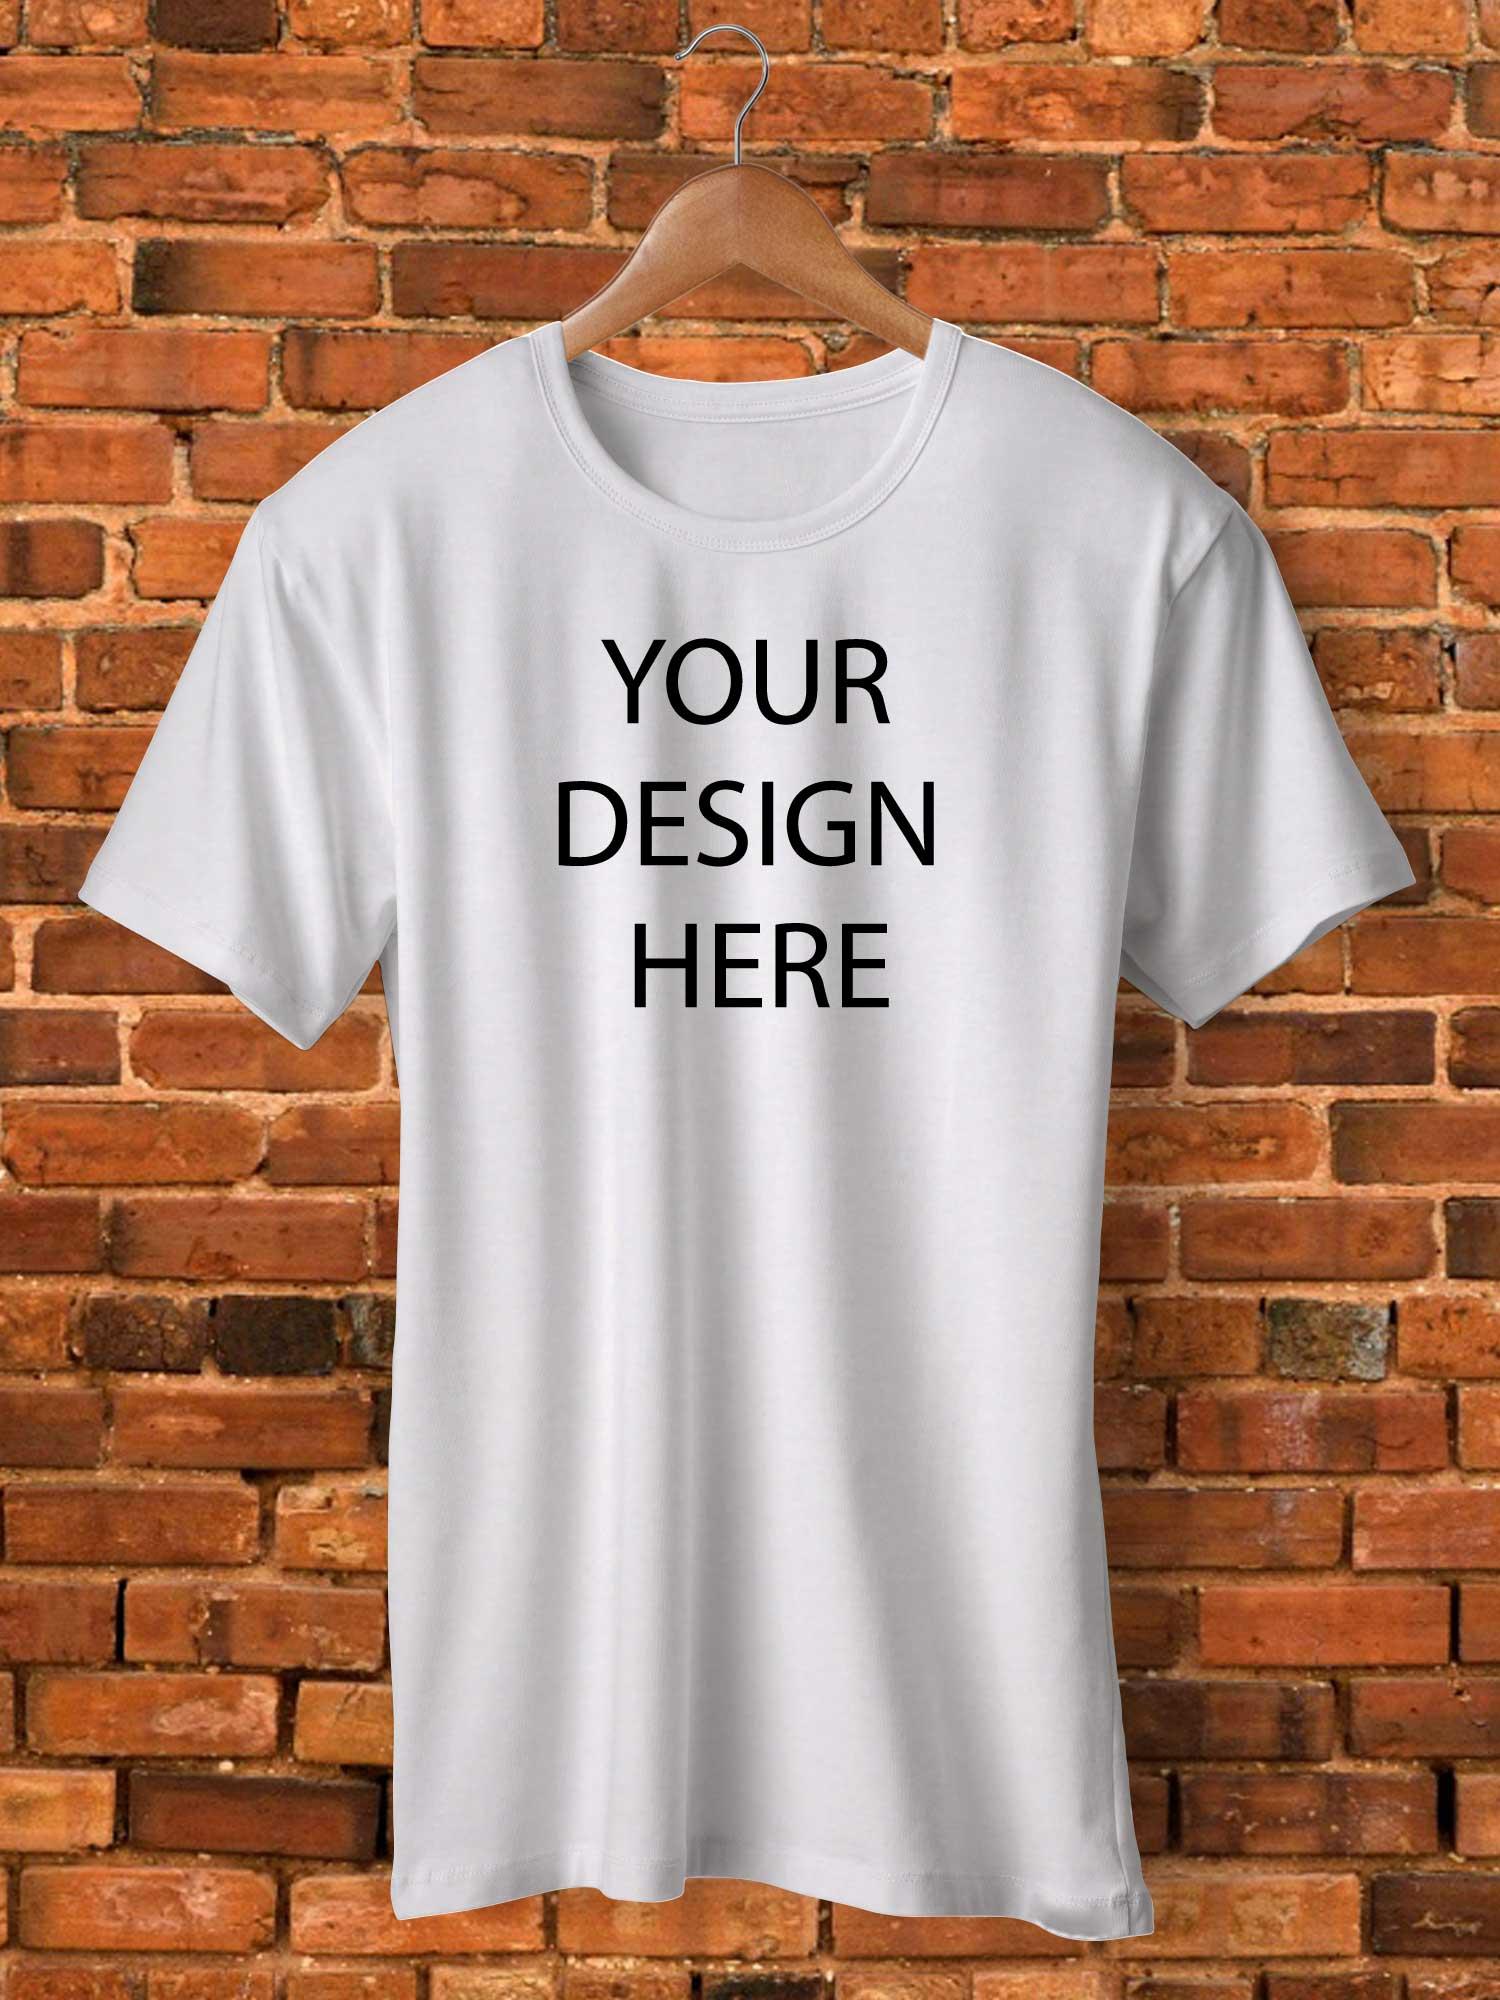 Buy Custom T Shirt with your design - Pickshop.pk